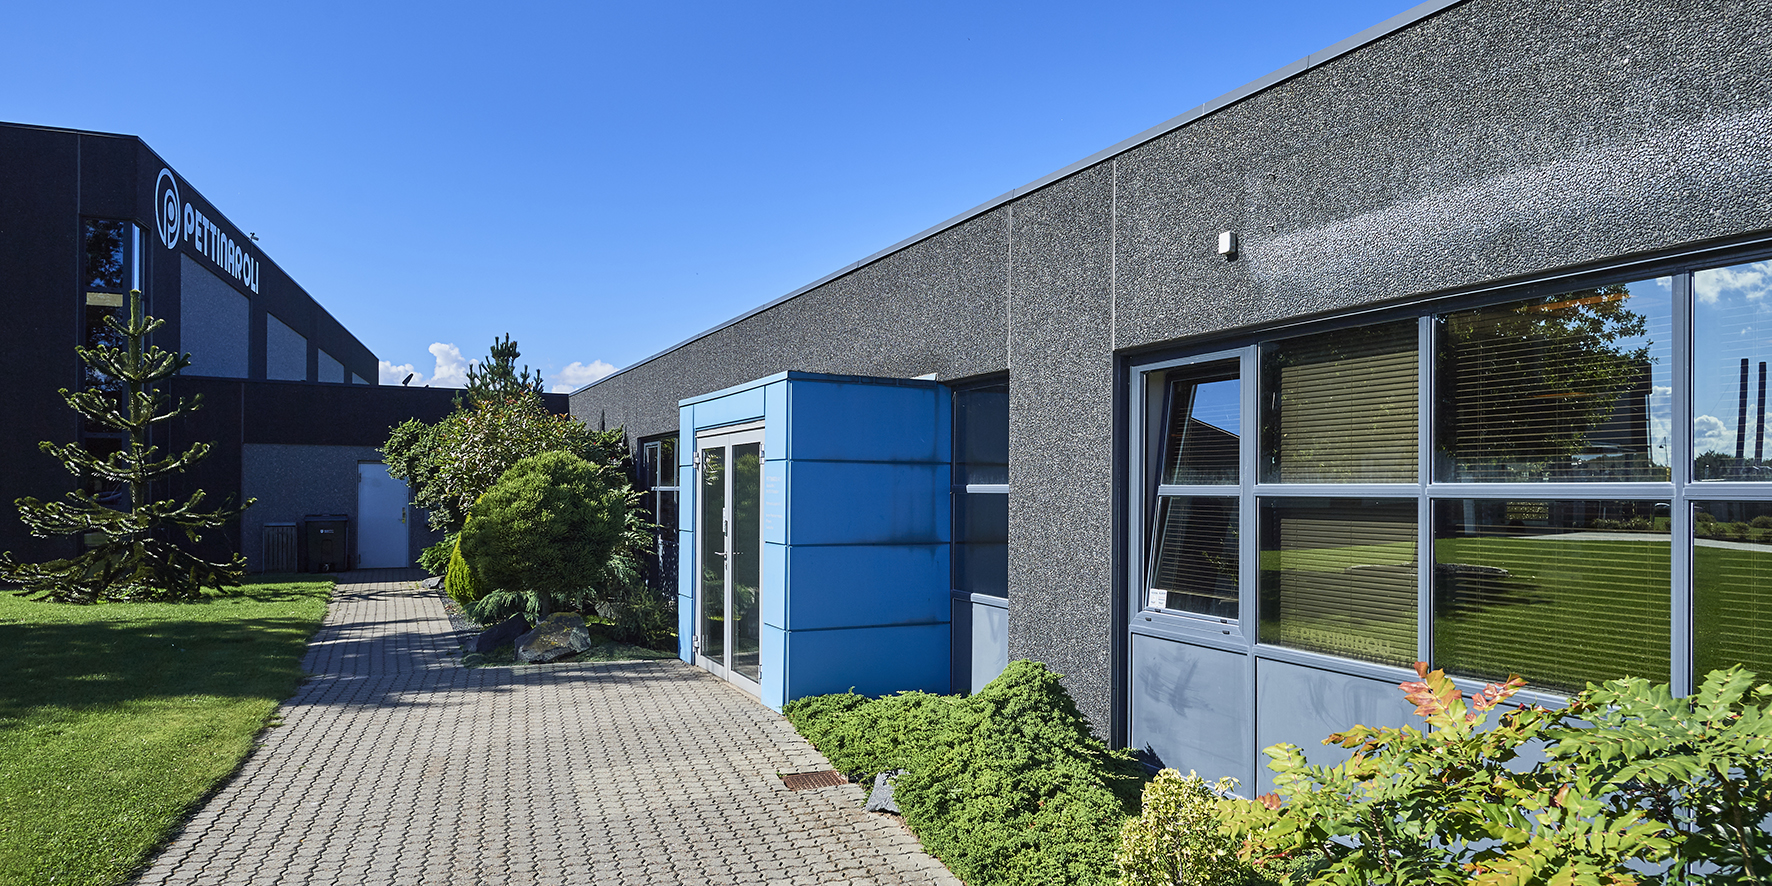 Pettinaroli hovedkontor, Middelfart Danmark